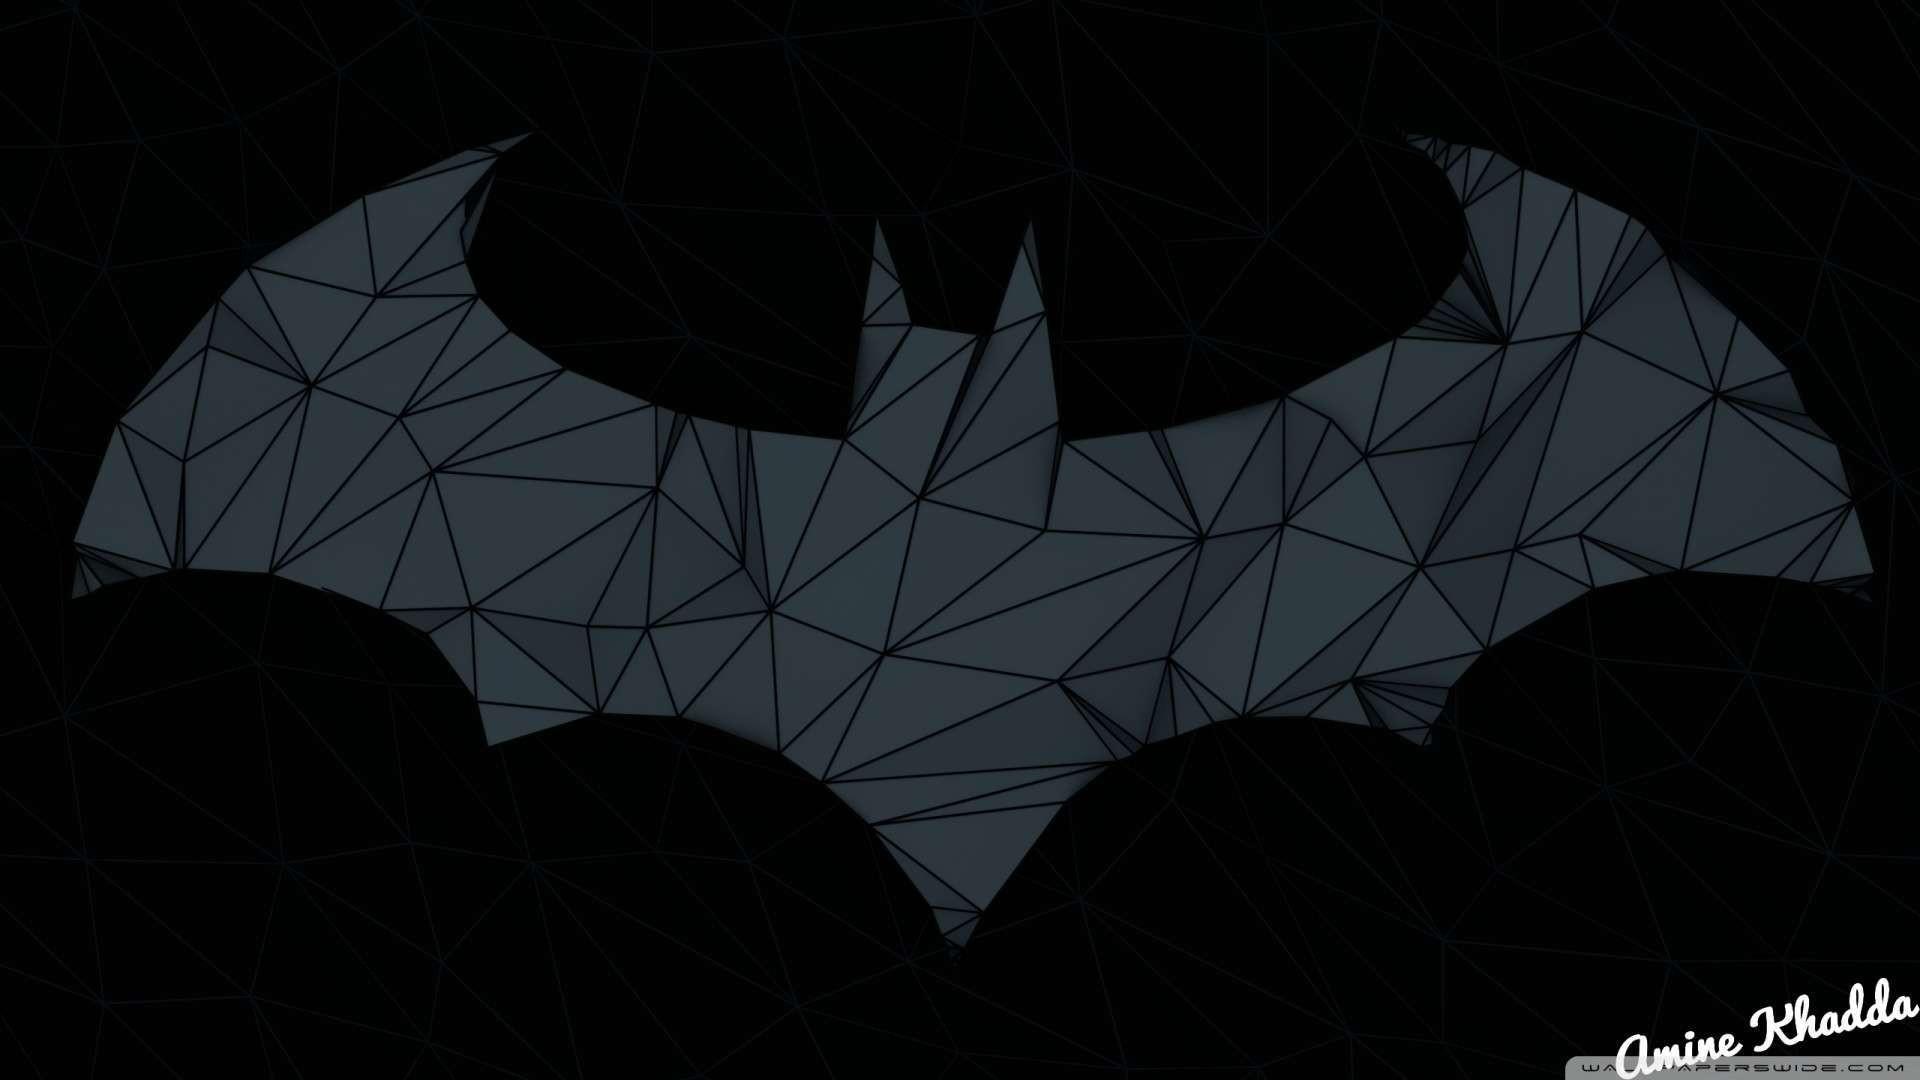 Wallpaper: Batman Arkham Origins Low Poly Logo 2 Wallpaper 1080p HD .